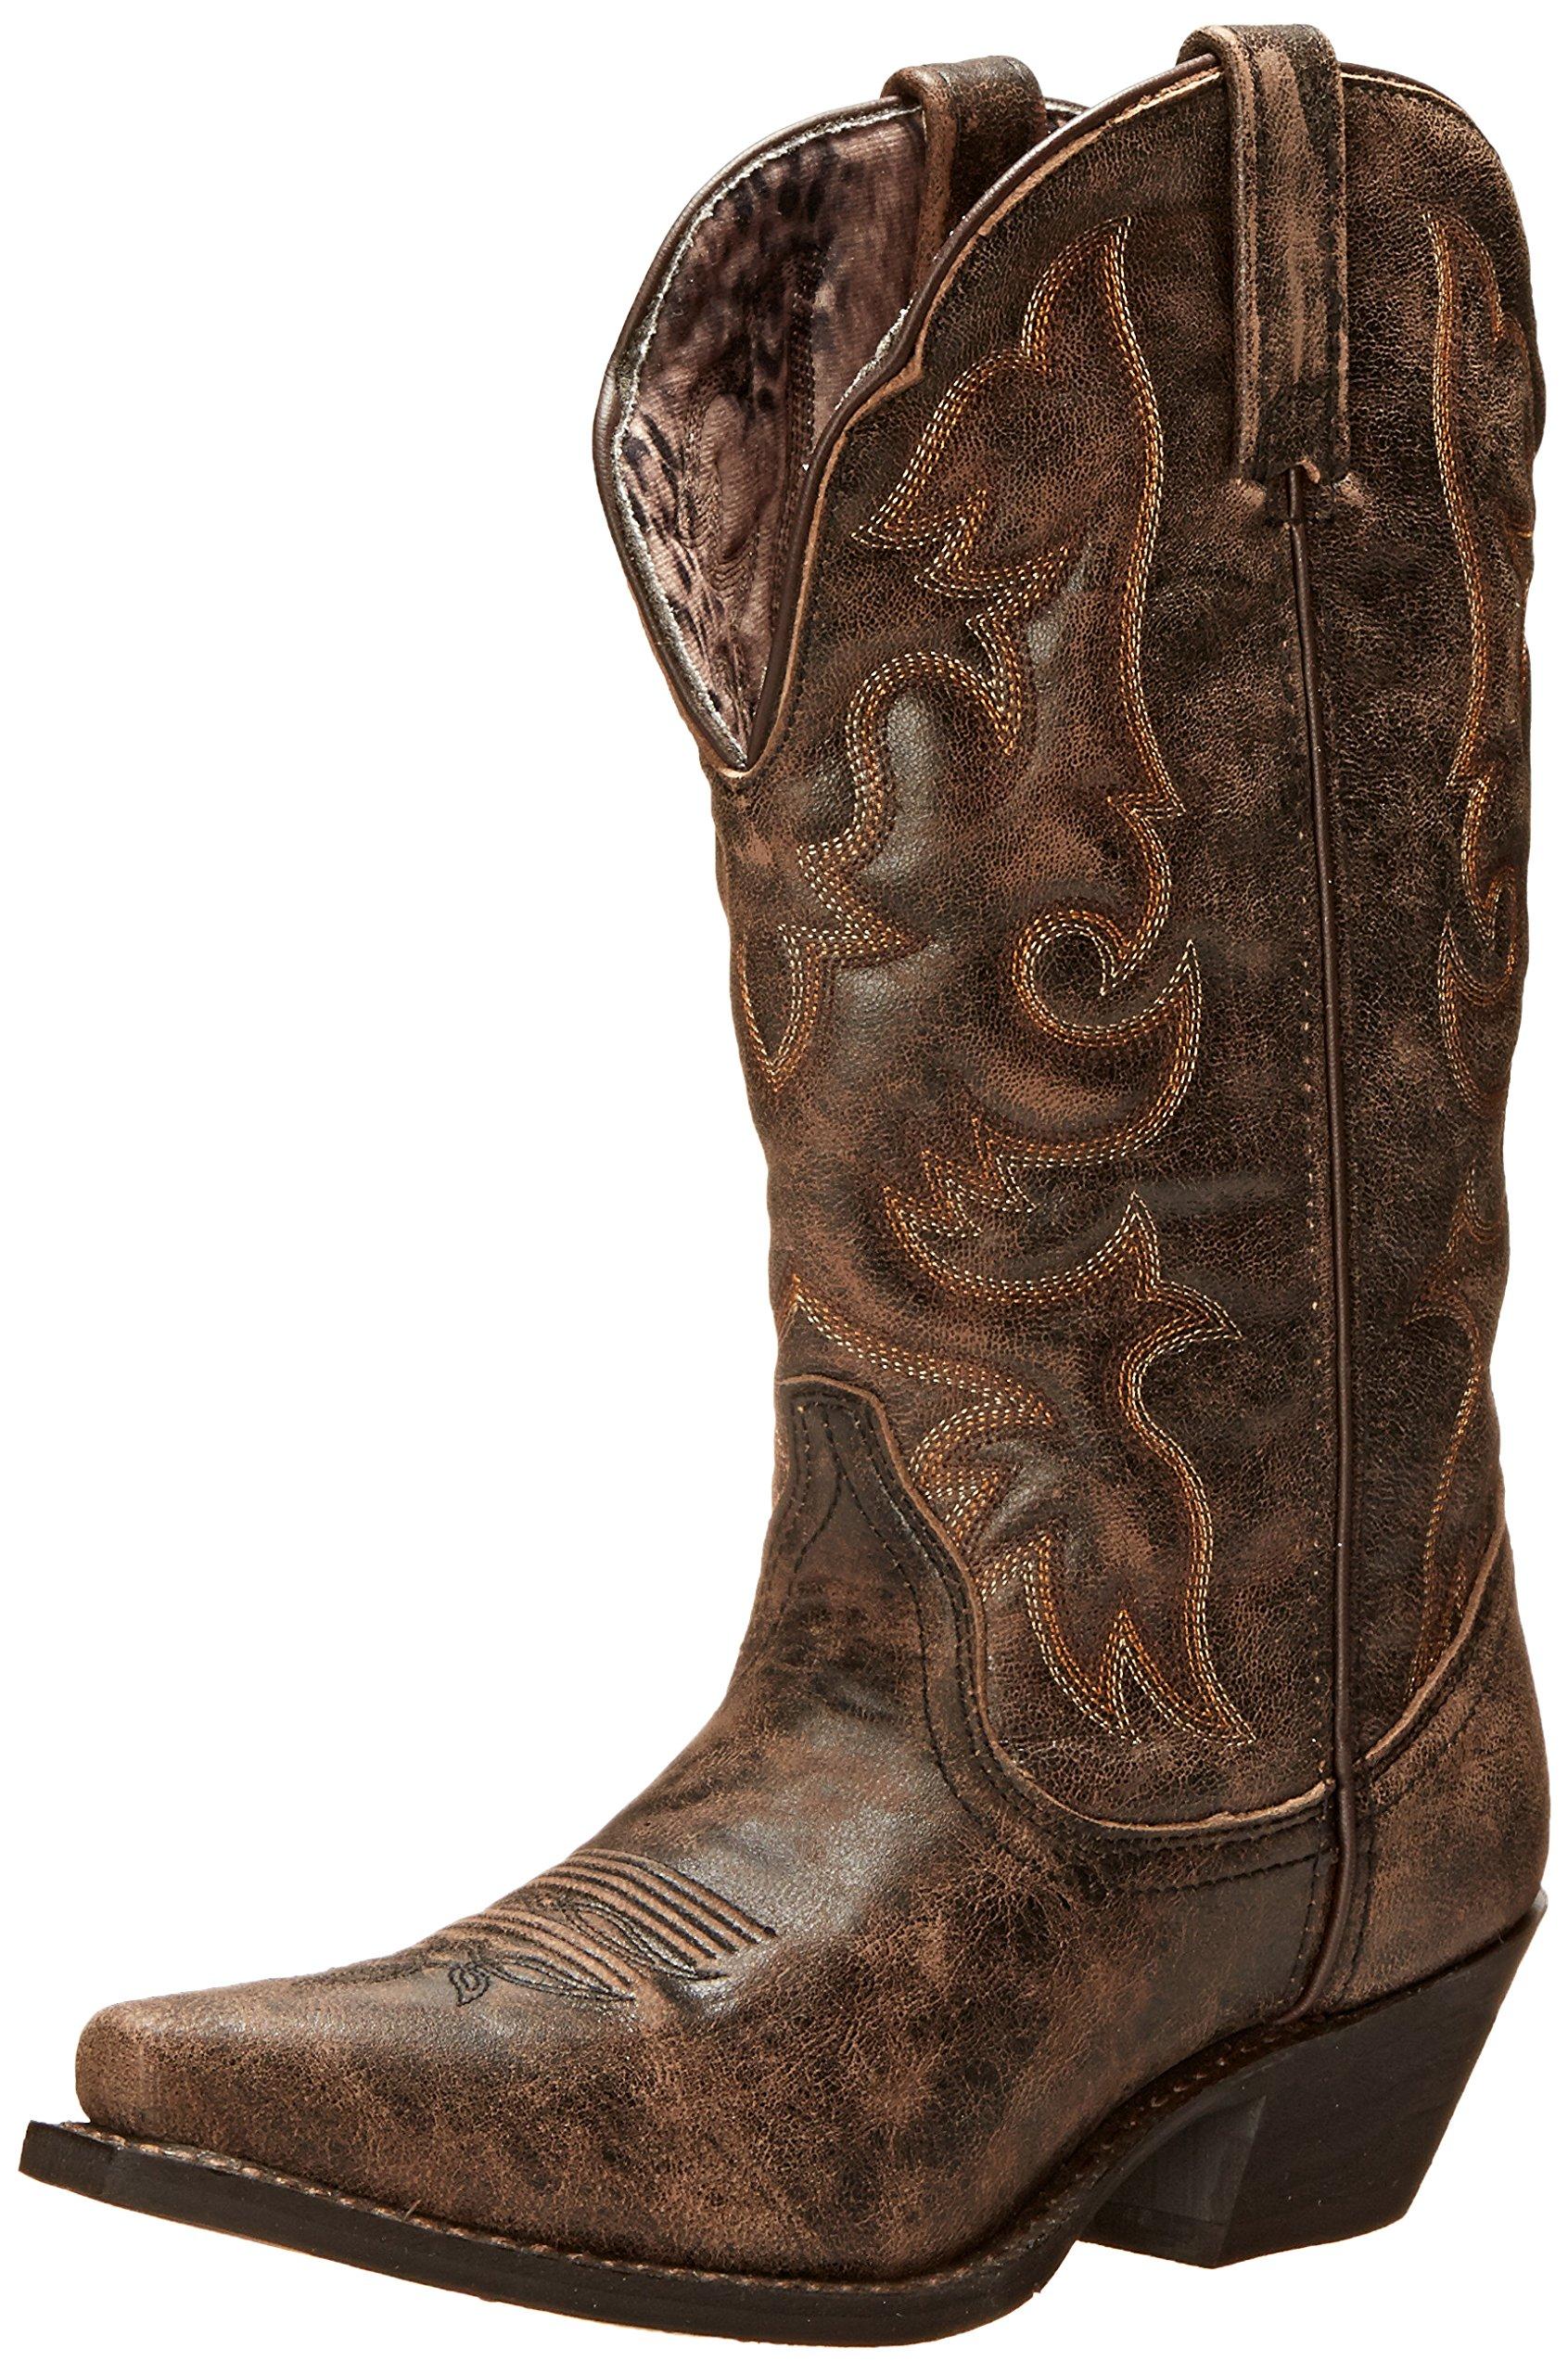 Laredo Women's Access Western Boot, Black/Tan, 8.5 M US